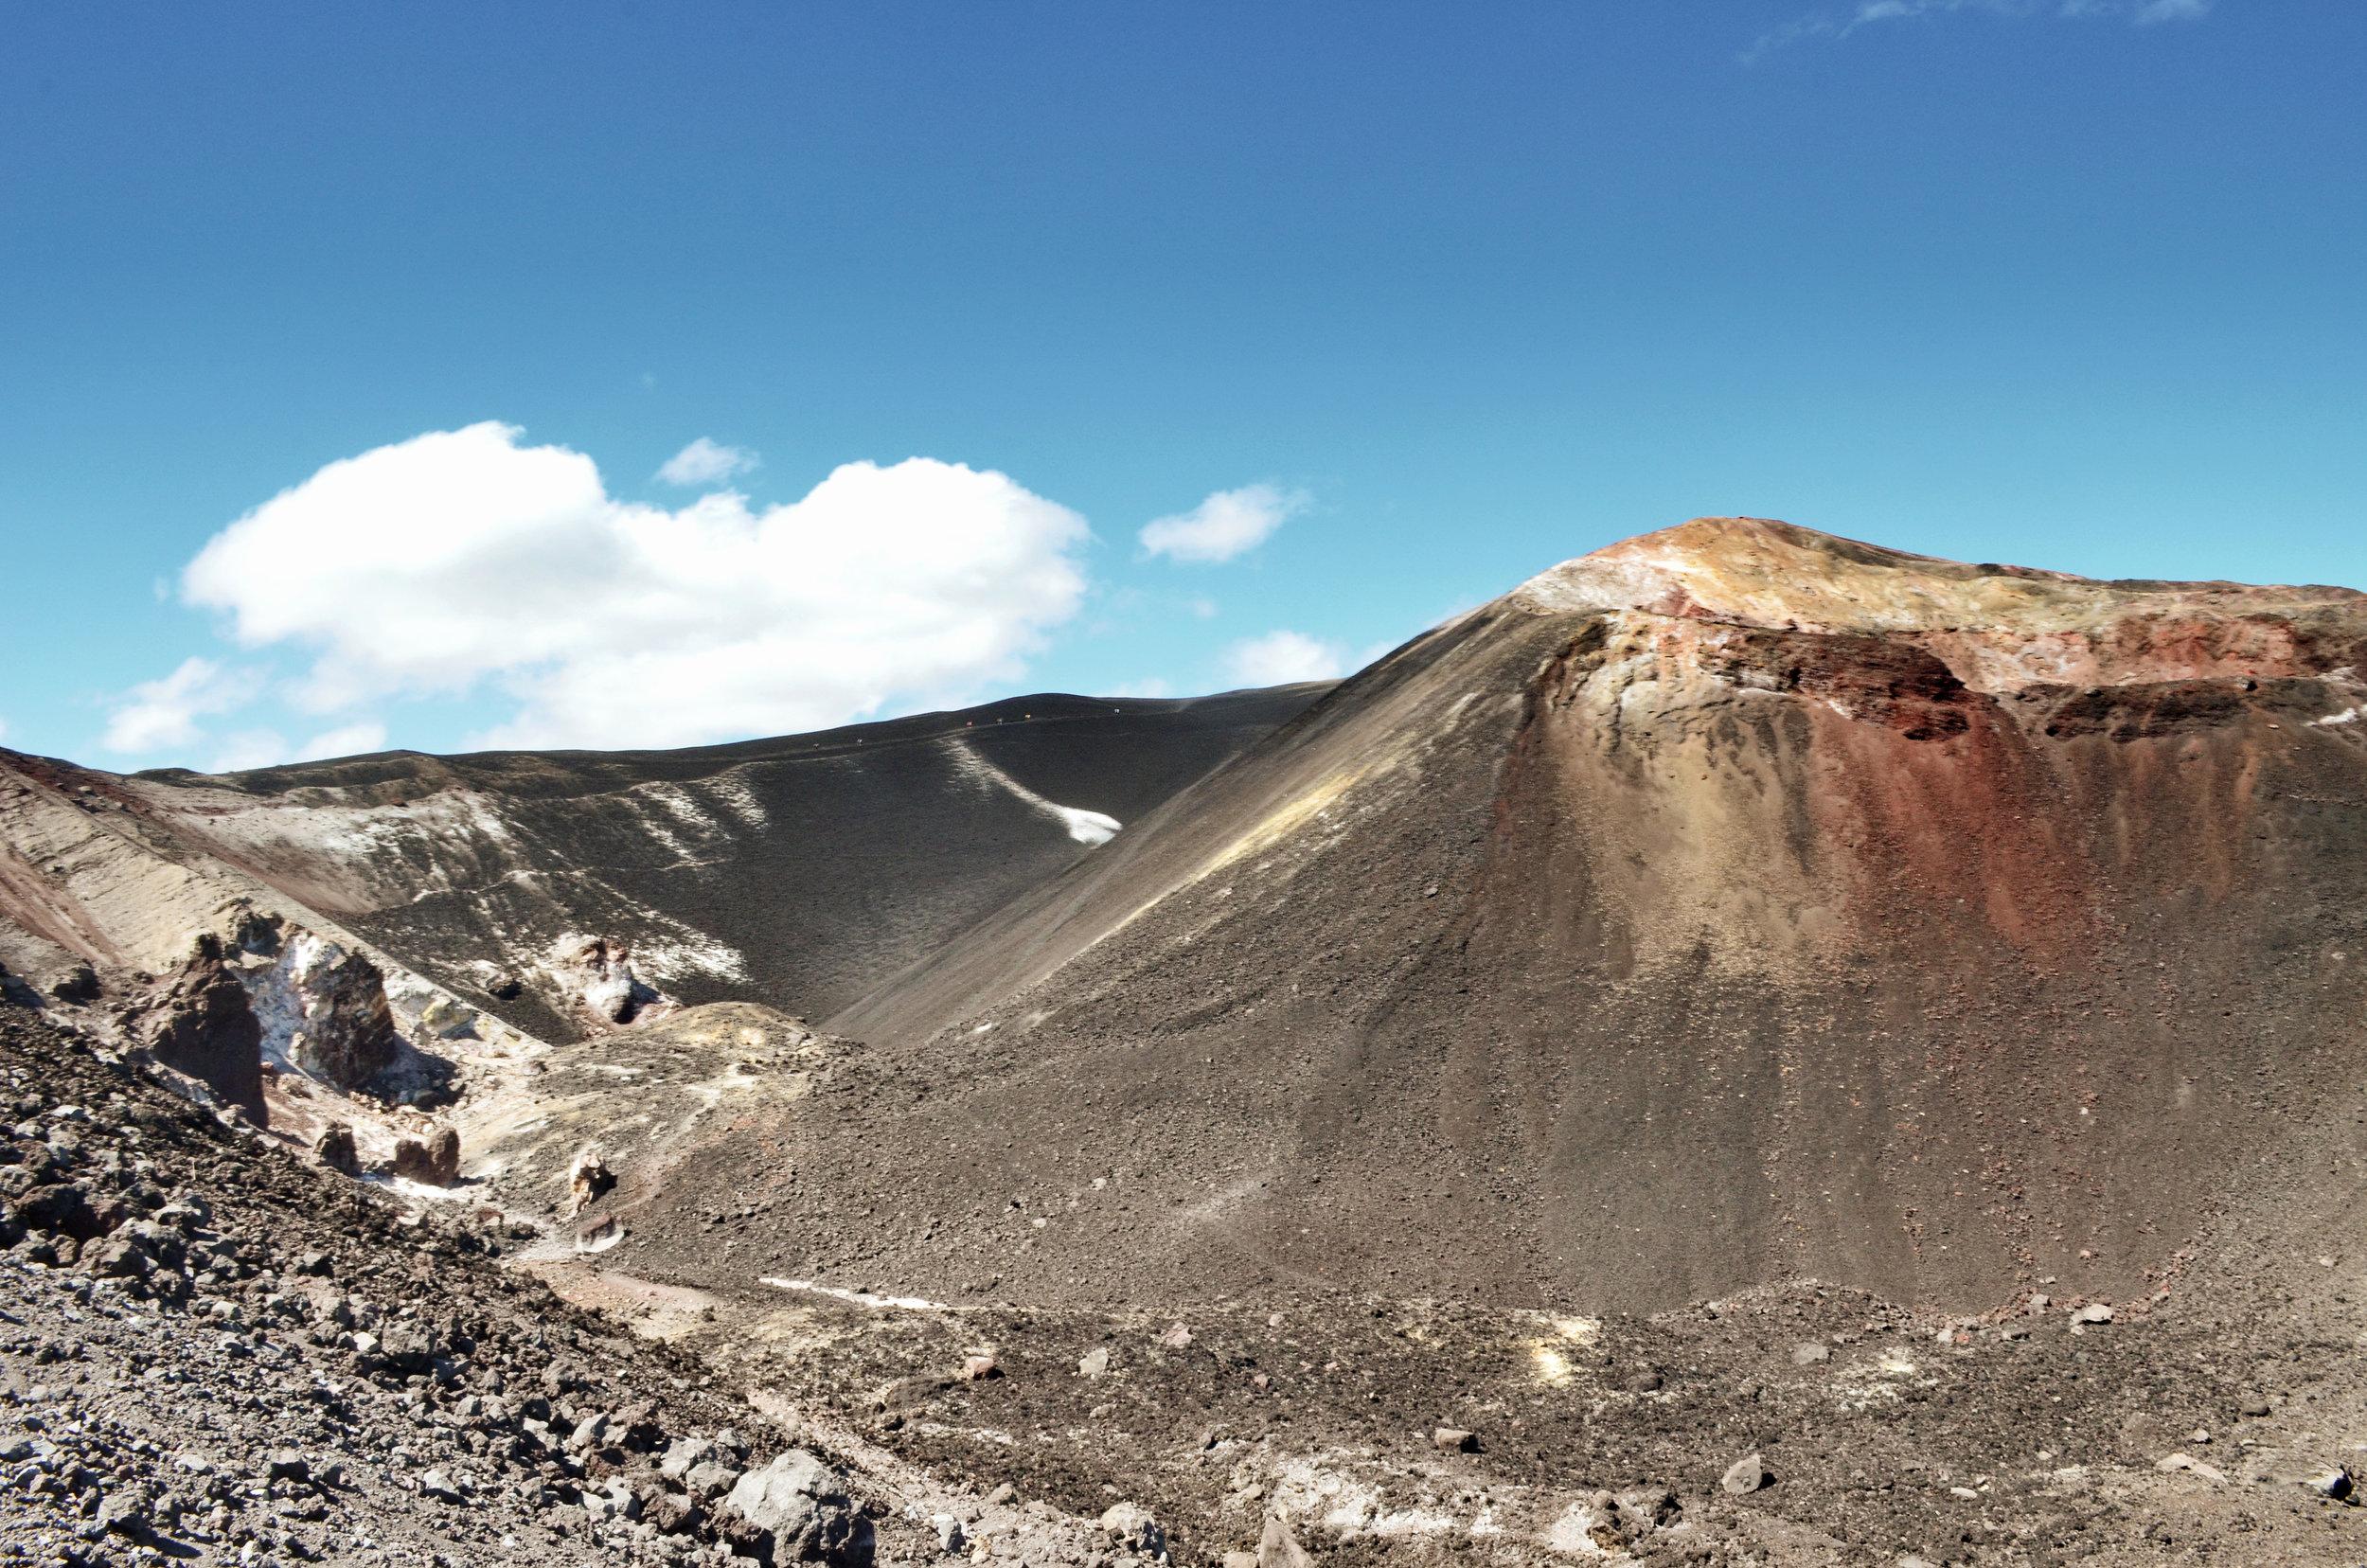 The hike up Cerro Negro